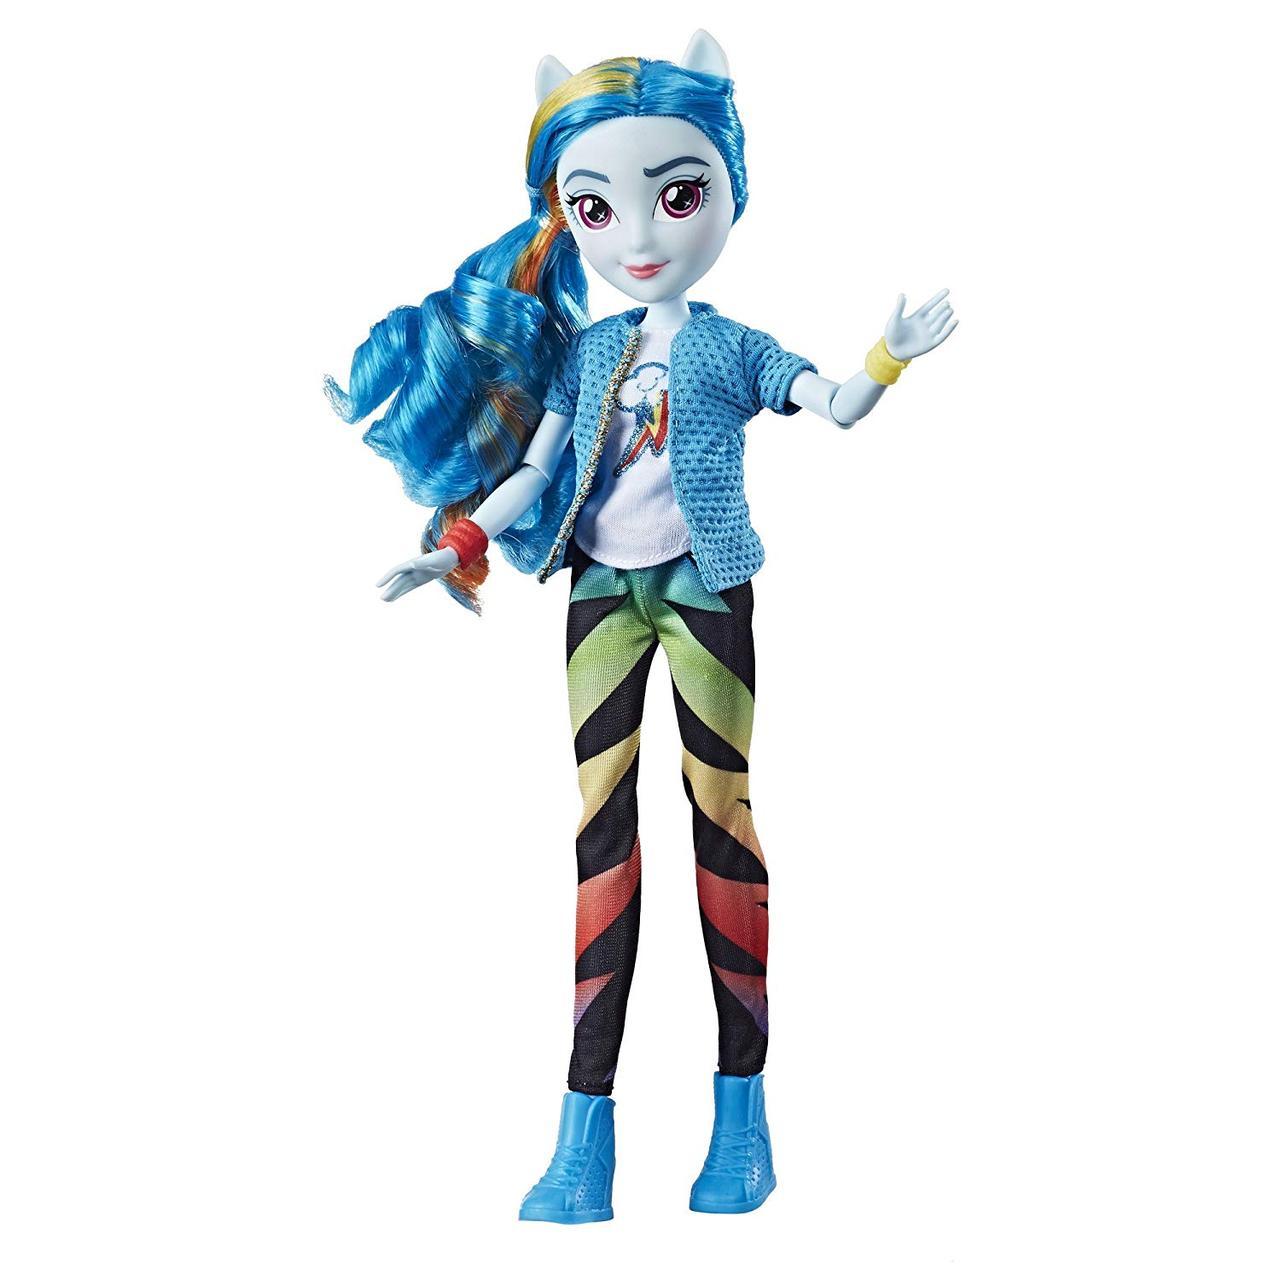 Кукла пони Рейнбоу Дэш Радуга классический стиль - My Little Pony Equestria Girls Classic Style Rainbow Dash